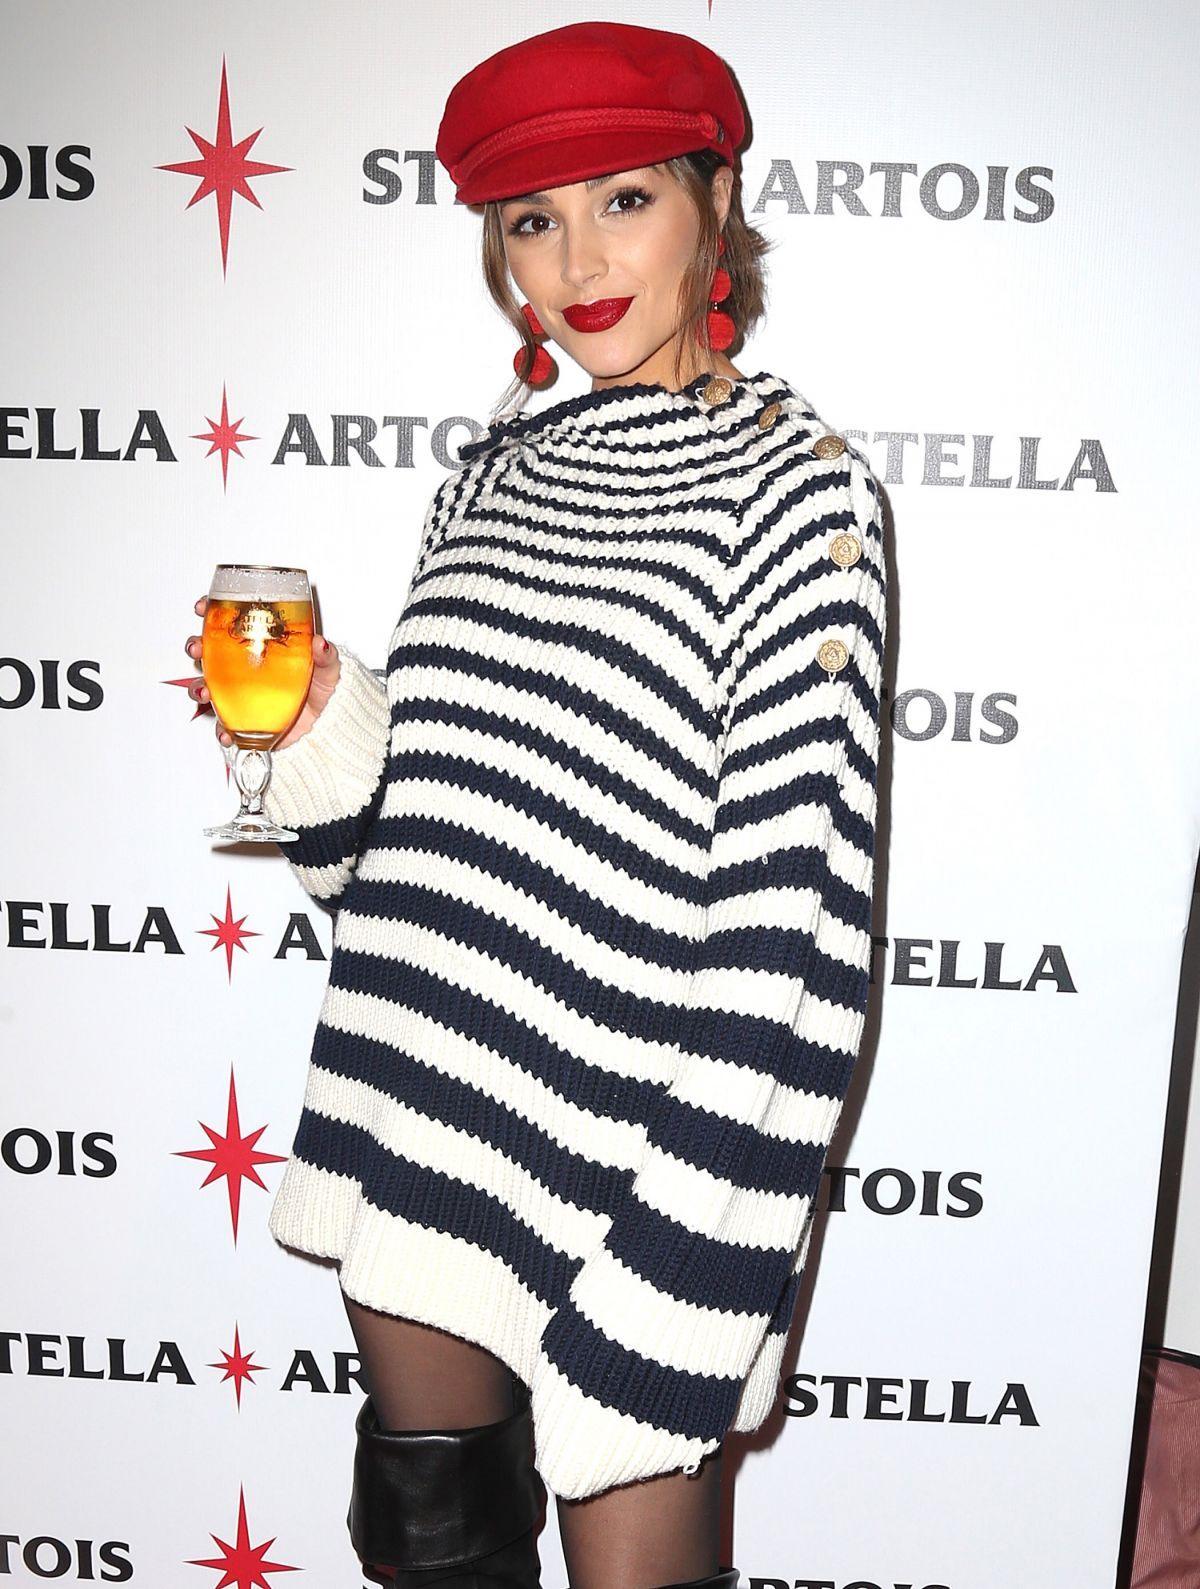 Olivia culpo at stella artois event in new york olivia